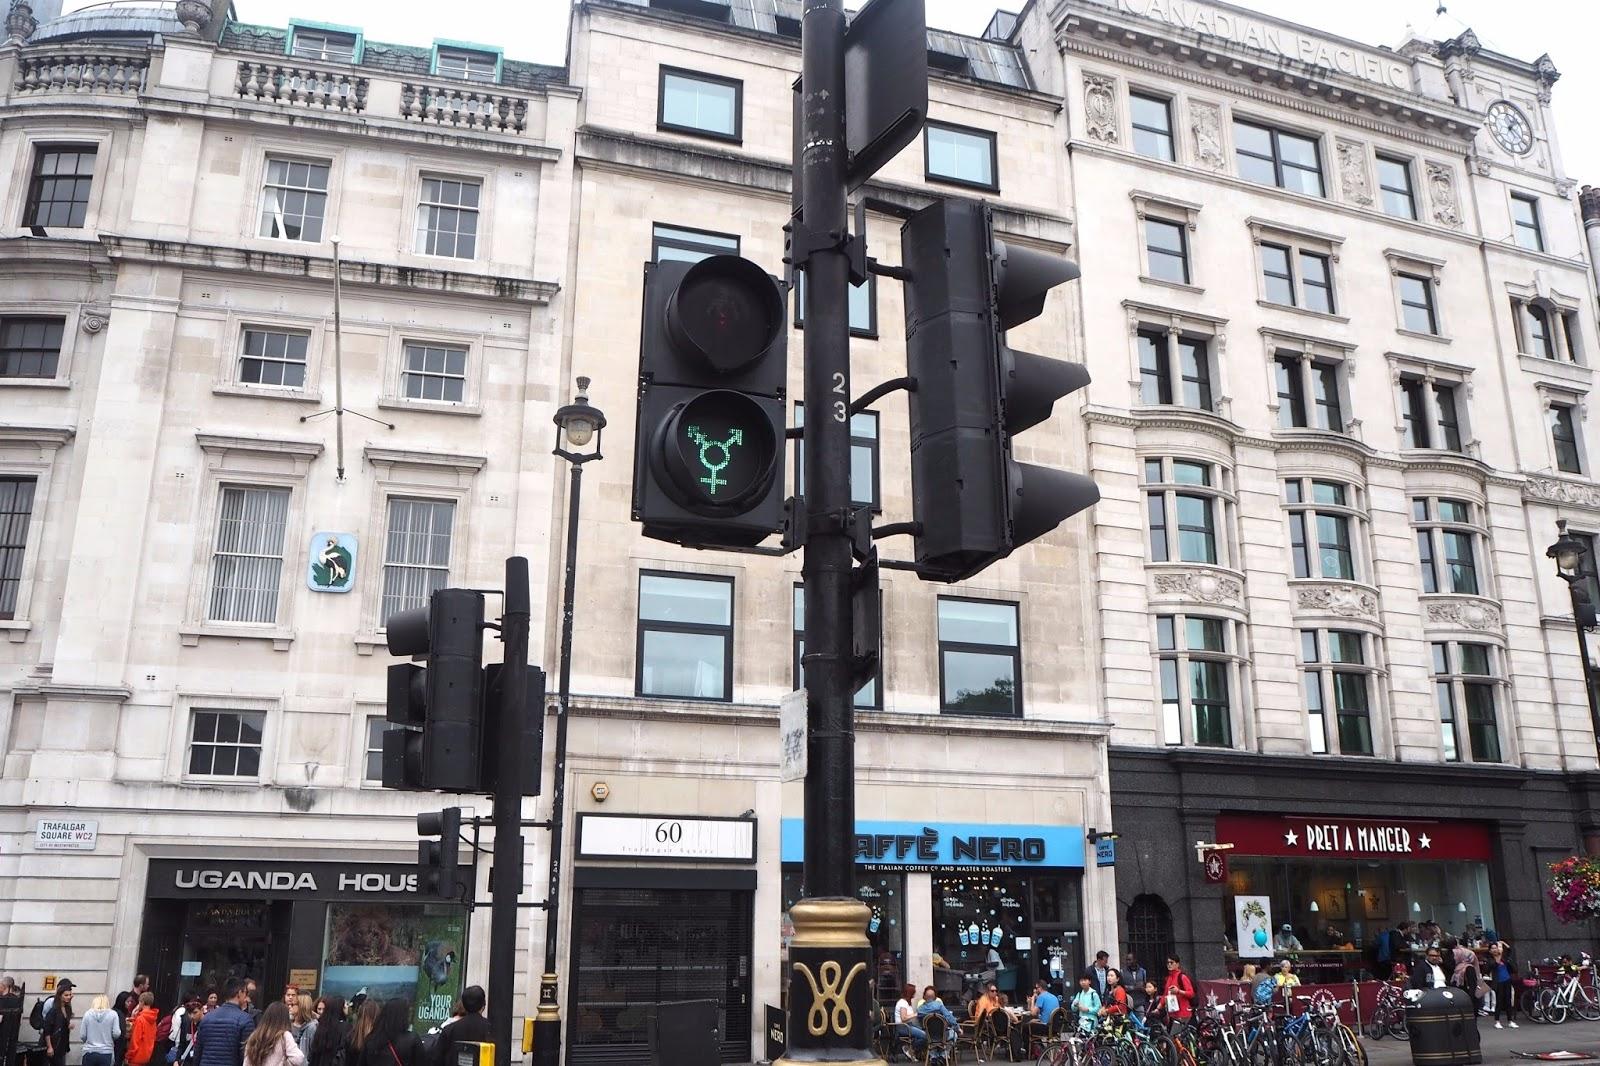 Universal traffic light